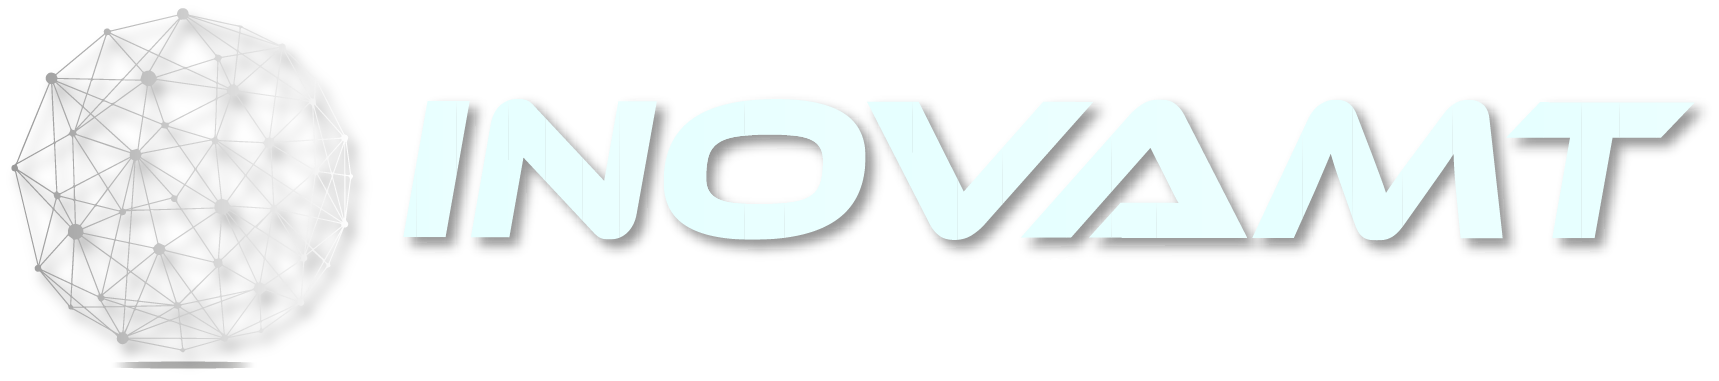 Rede INOVA MT